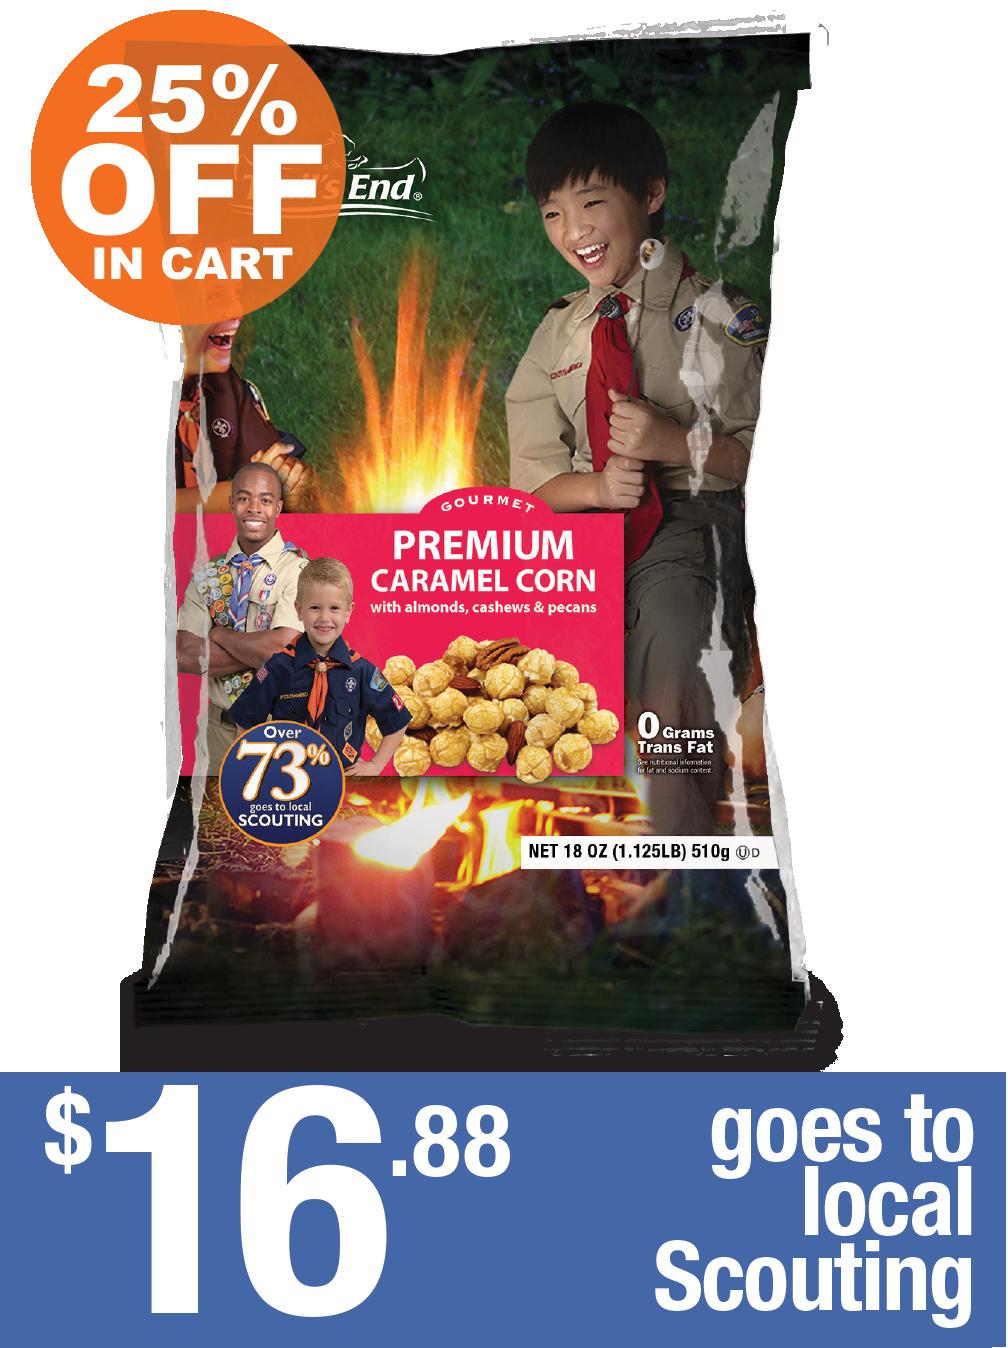 Premium Caramel Corn with Nuts